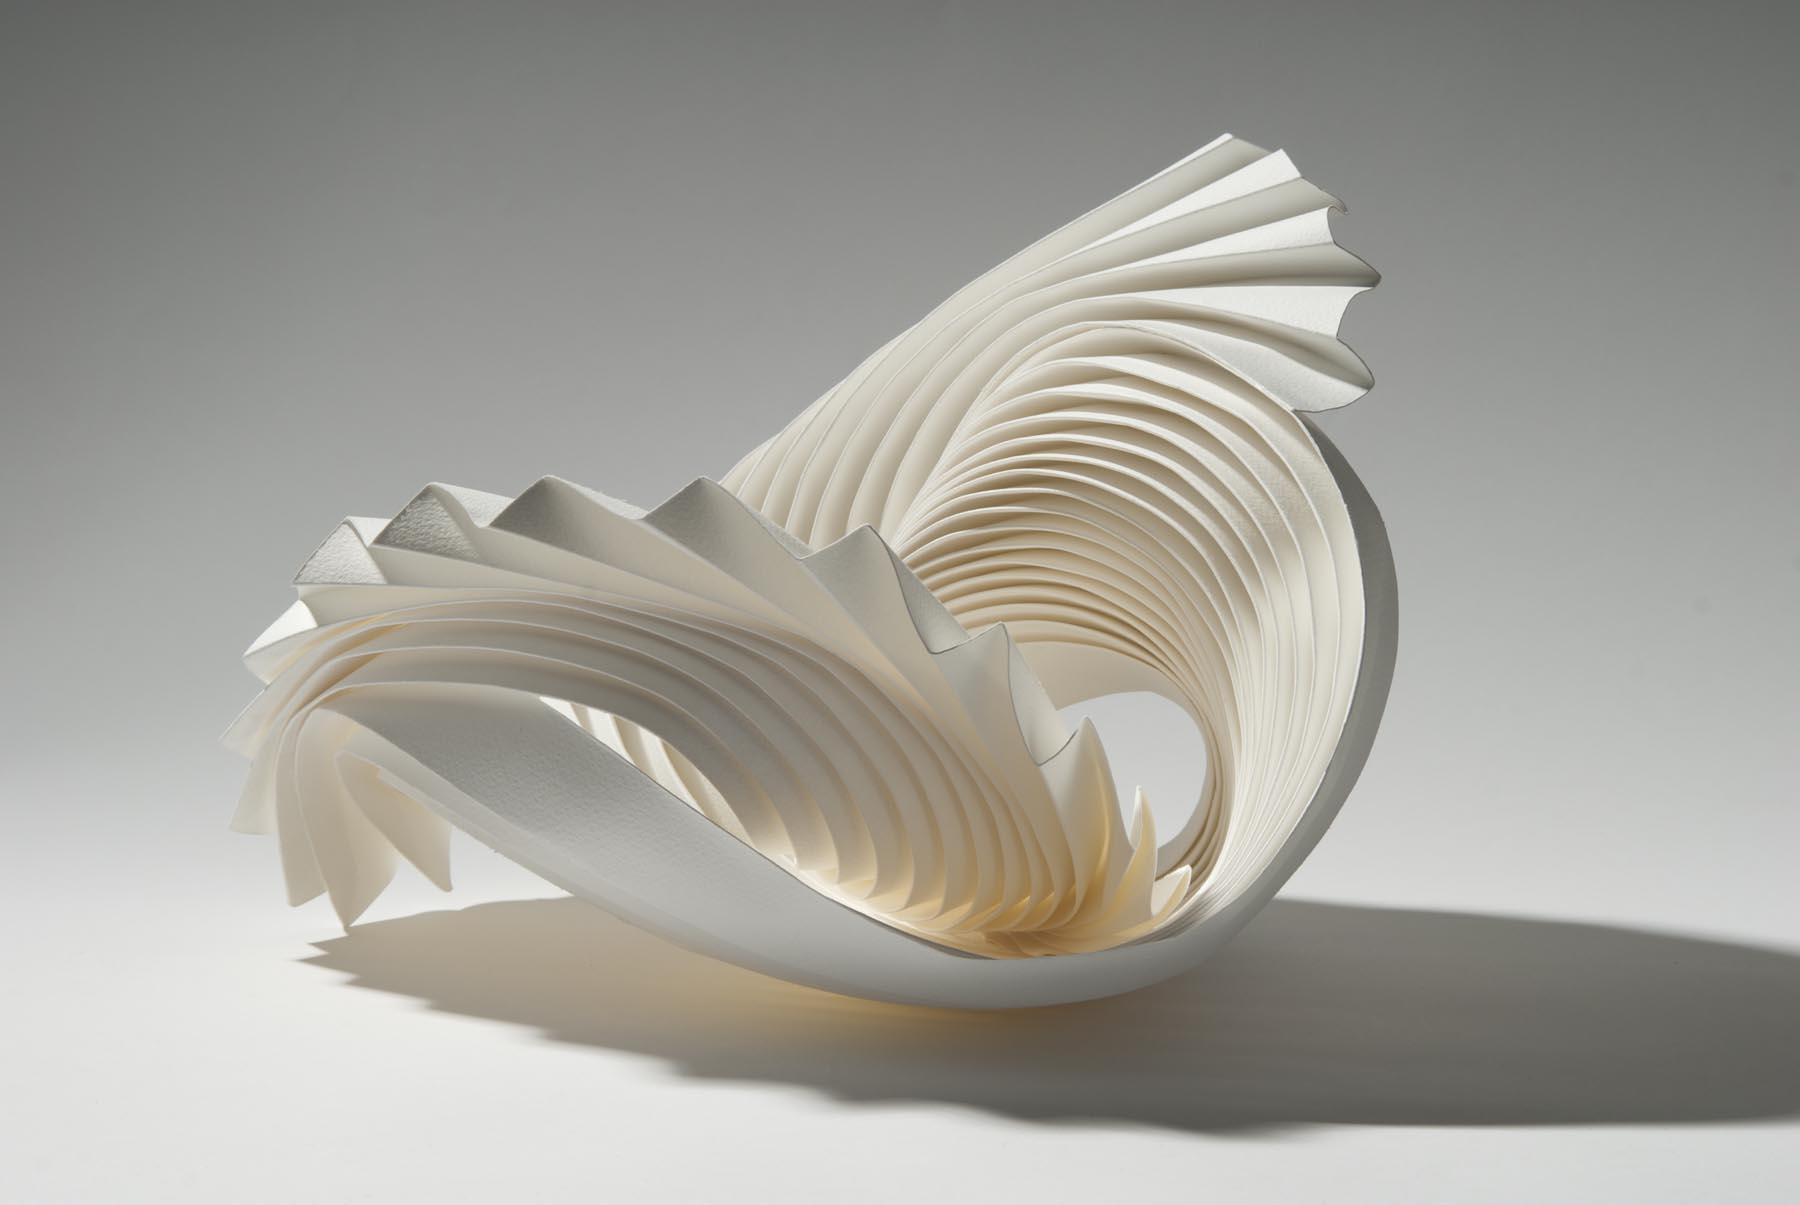 Interesting Art from Interesting Artists